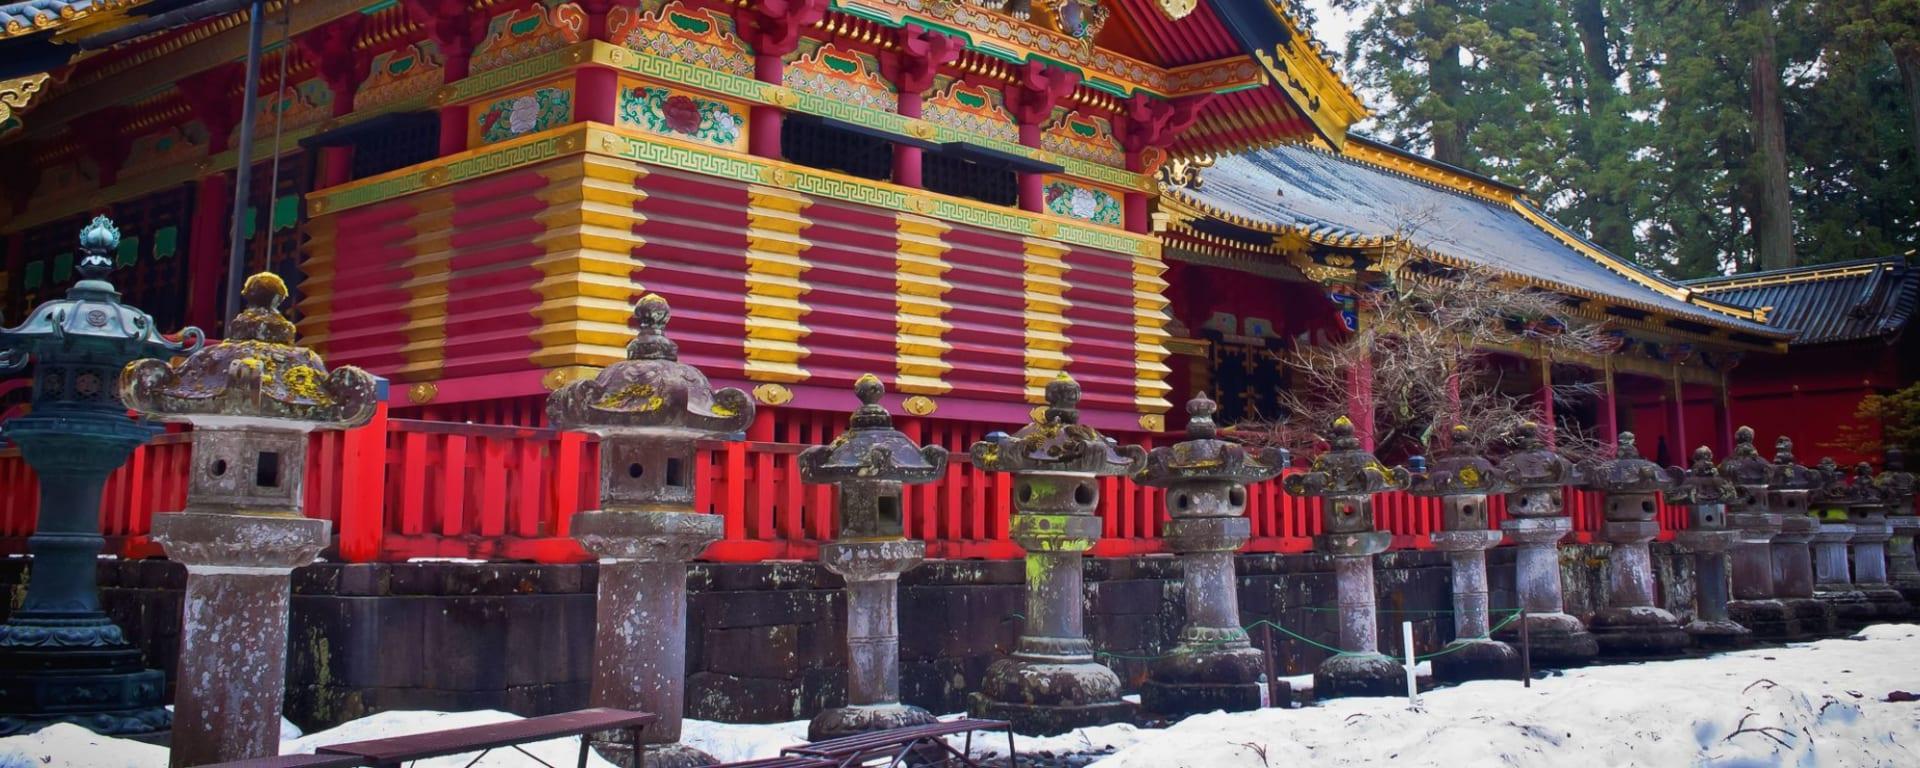 Tagesausflug nach Nikko in Tokio: Nikko: Toshogu Shrine